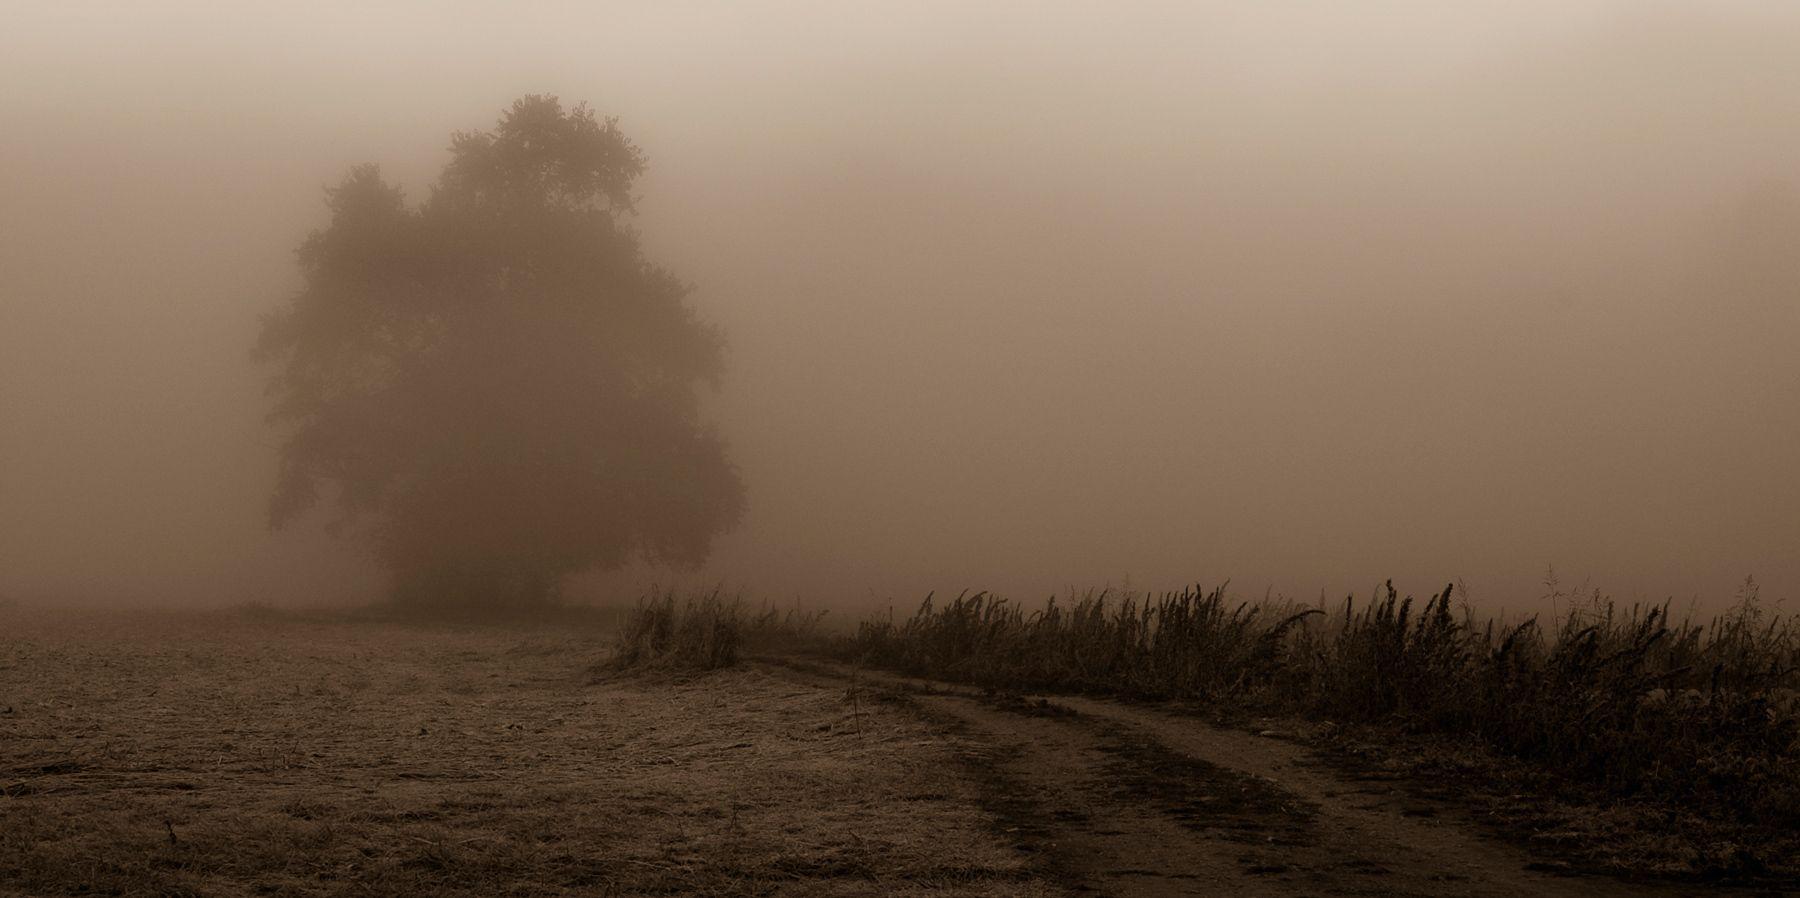 1lone_tree_foggy_field.jpg